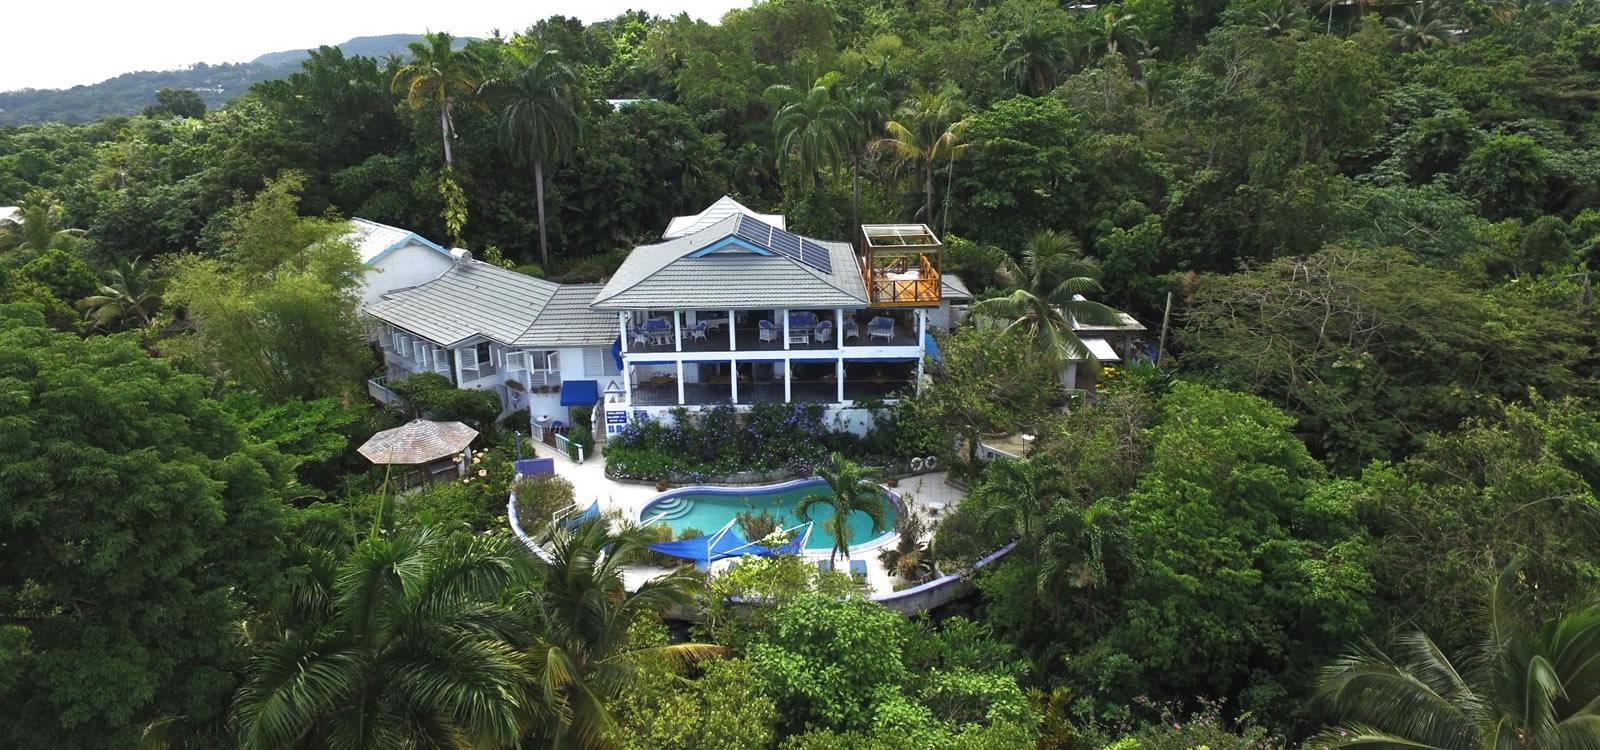 11 Key Boutique Hotel For Sale In Jamaica S Port Antonio